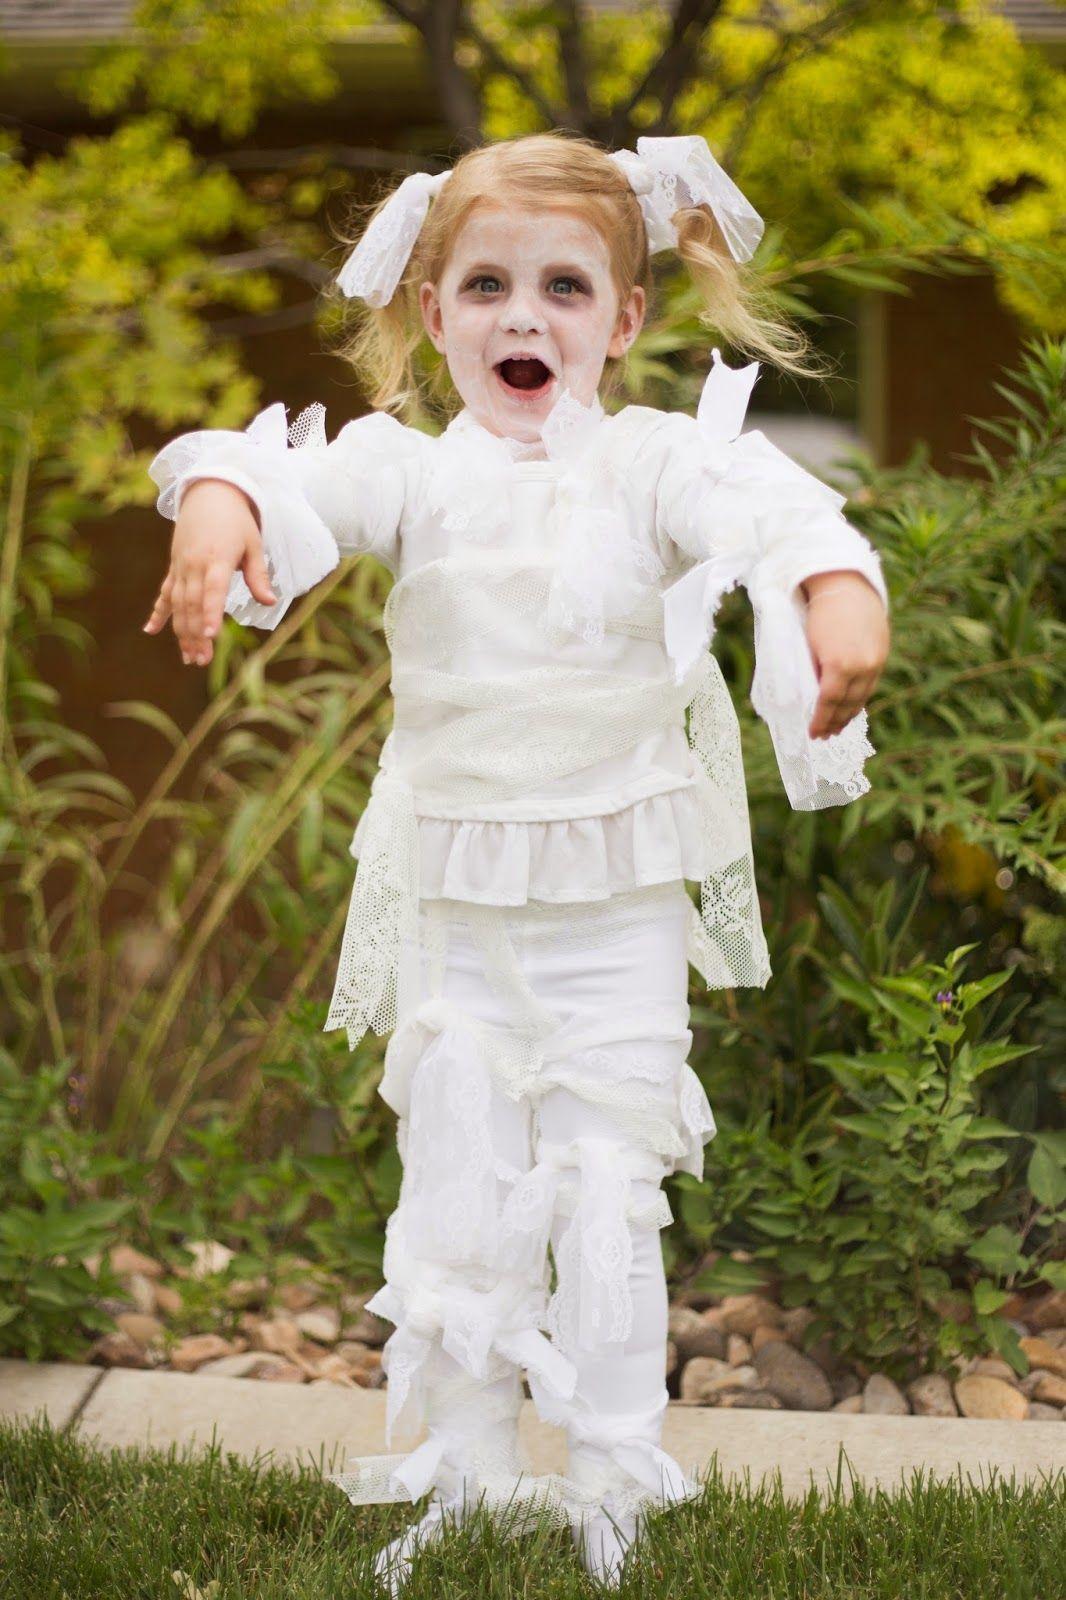 Do it yourself divas diy costumes pinterest do it yourself divas diy little girl lace mummy halloween costume halloween costume ideas for kids halloween dress up little girl solutioingenieria Gallery